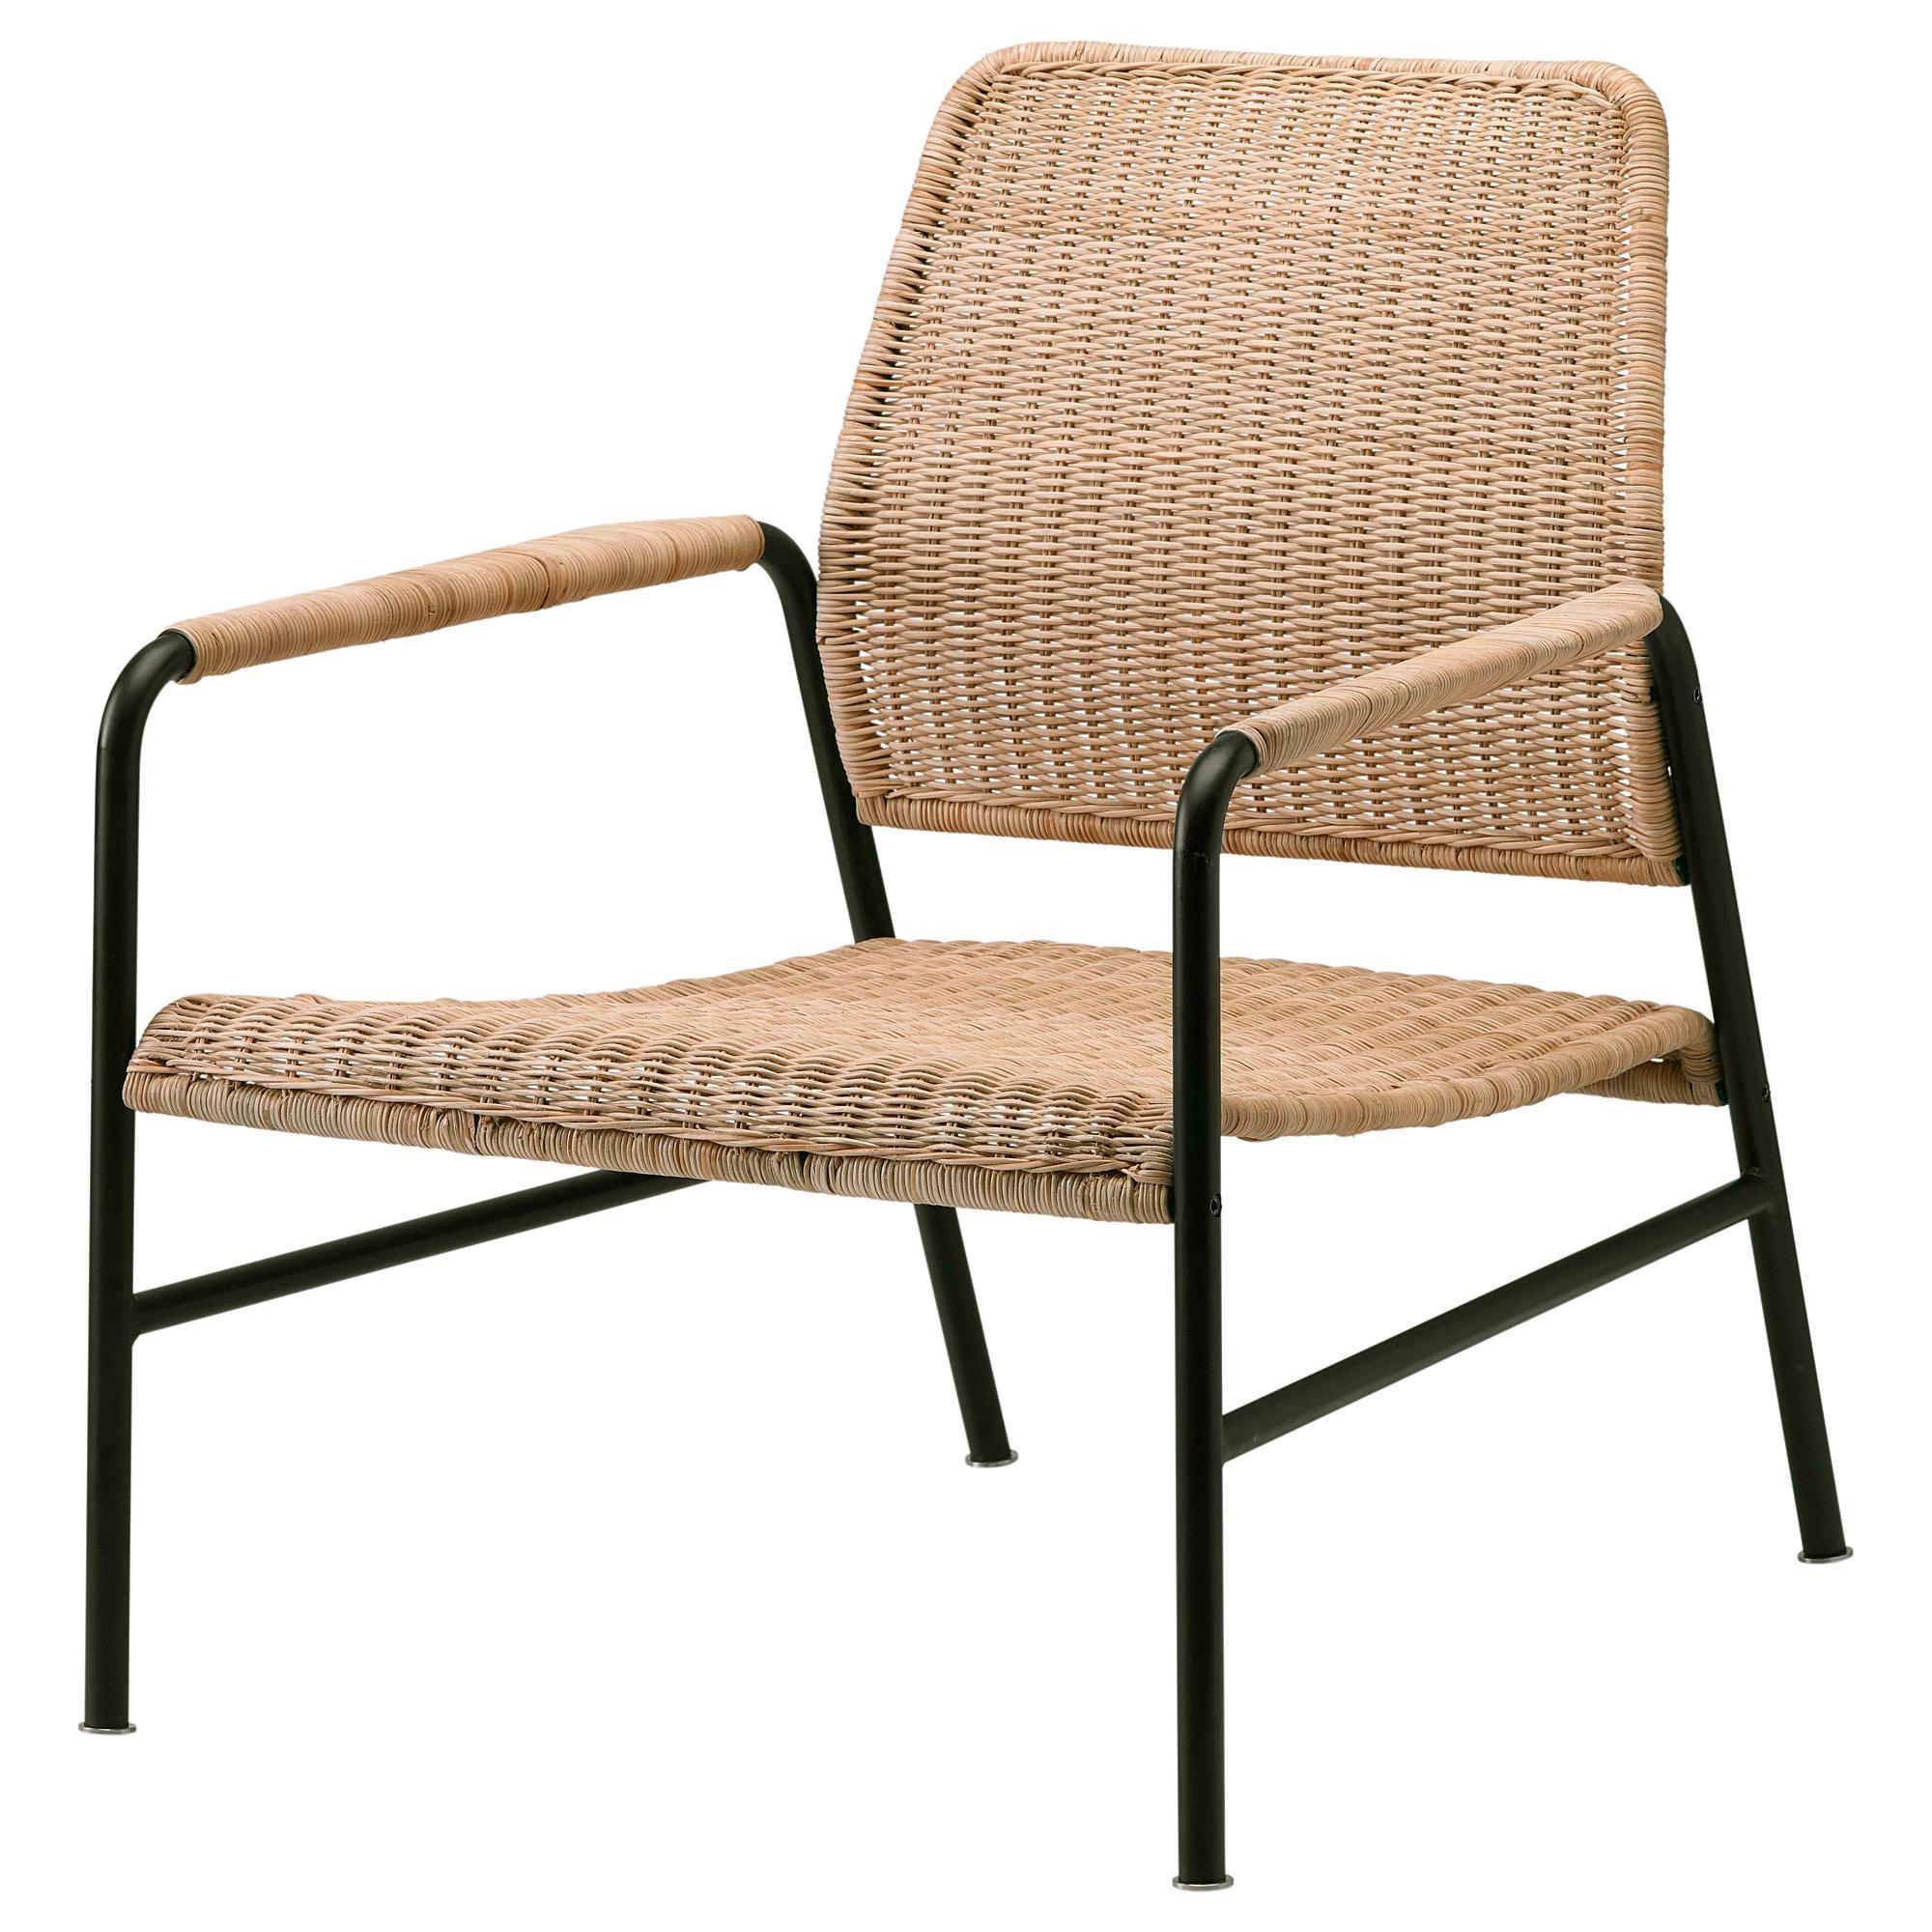 ulriksberg крісло